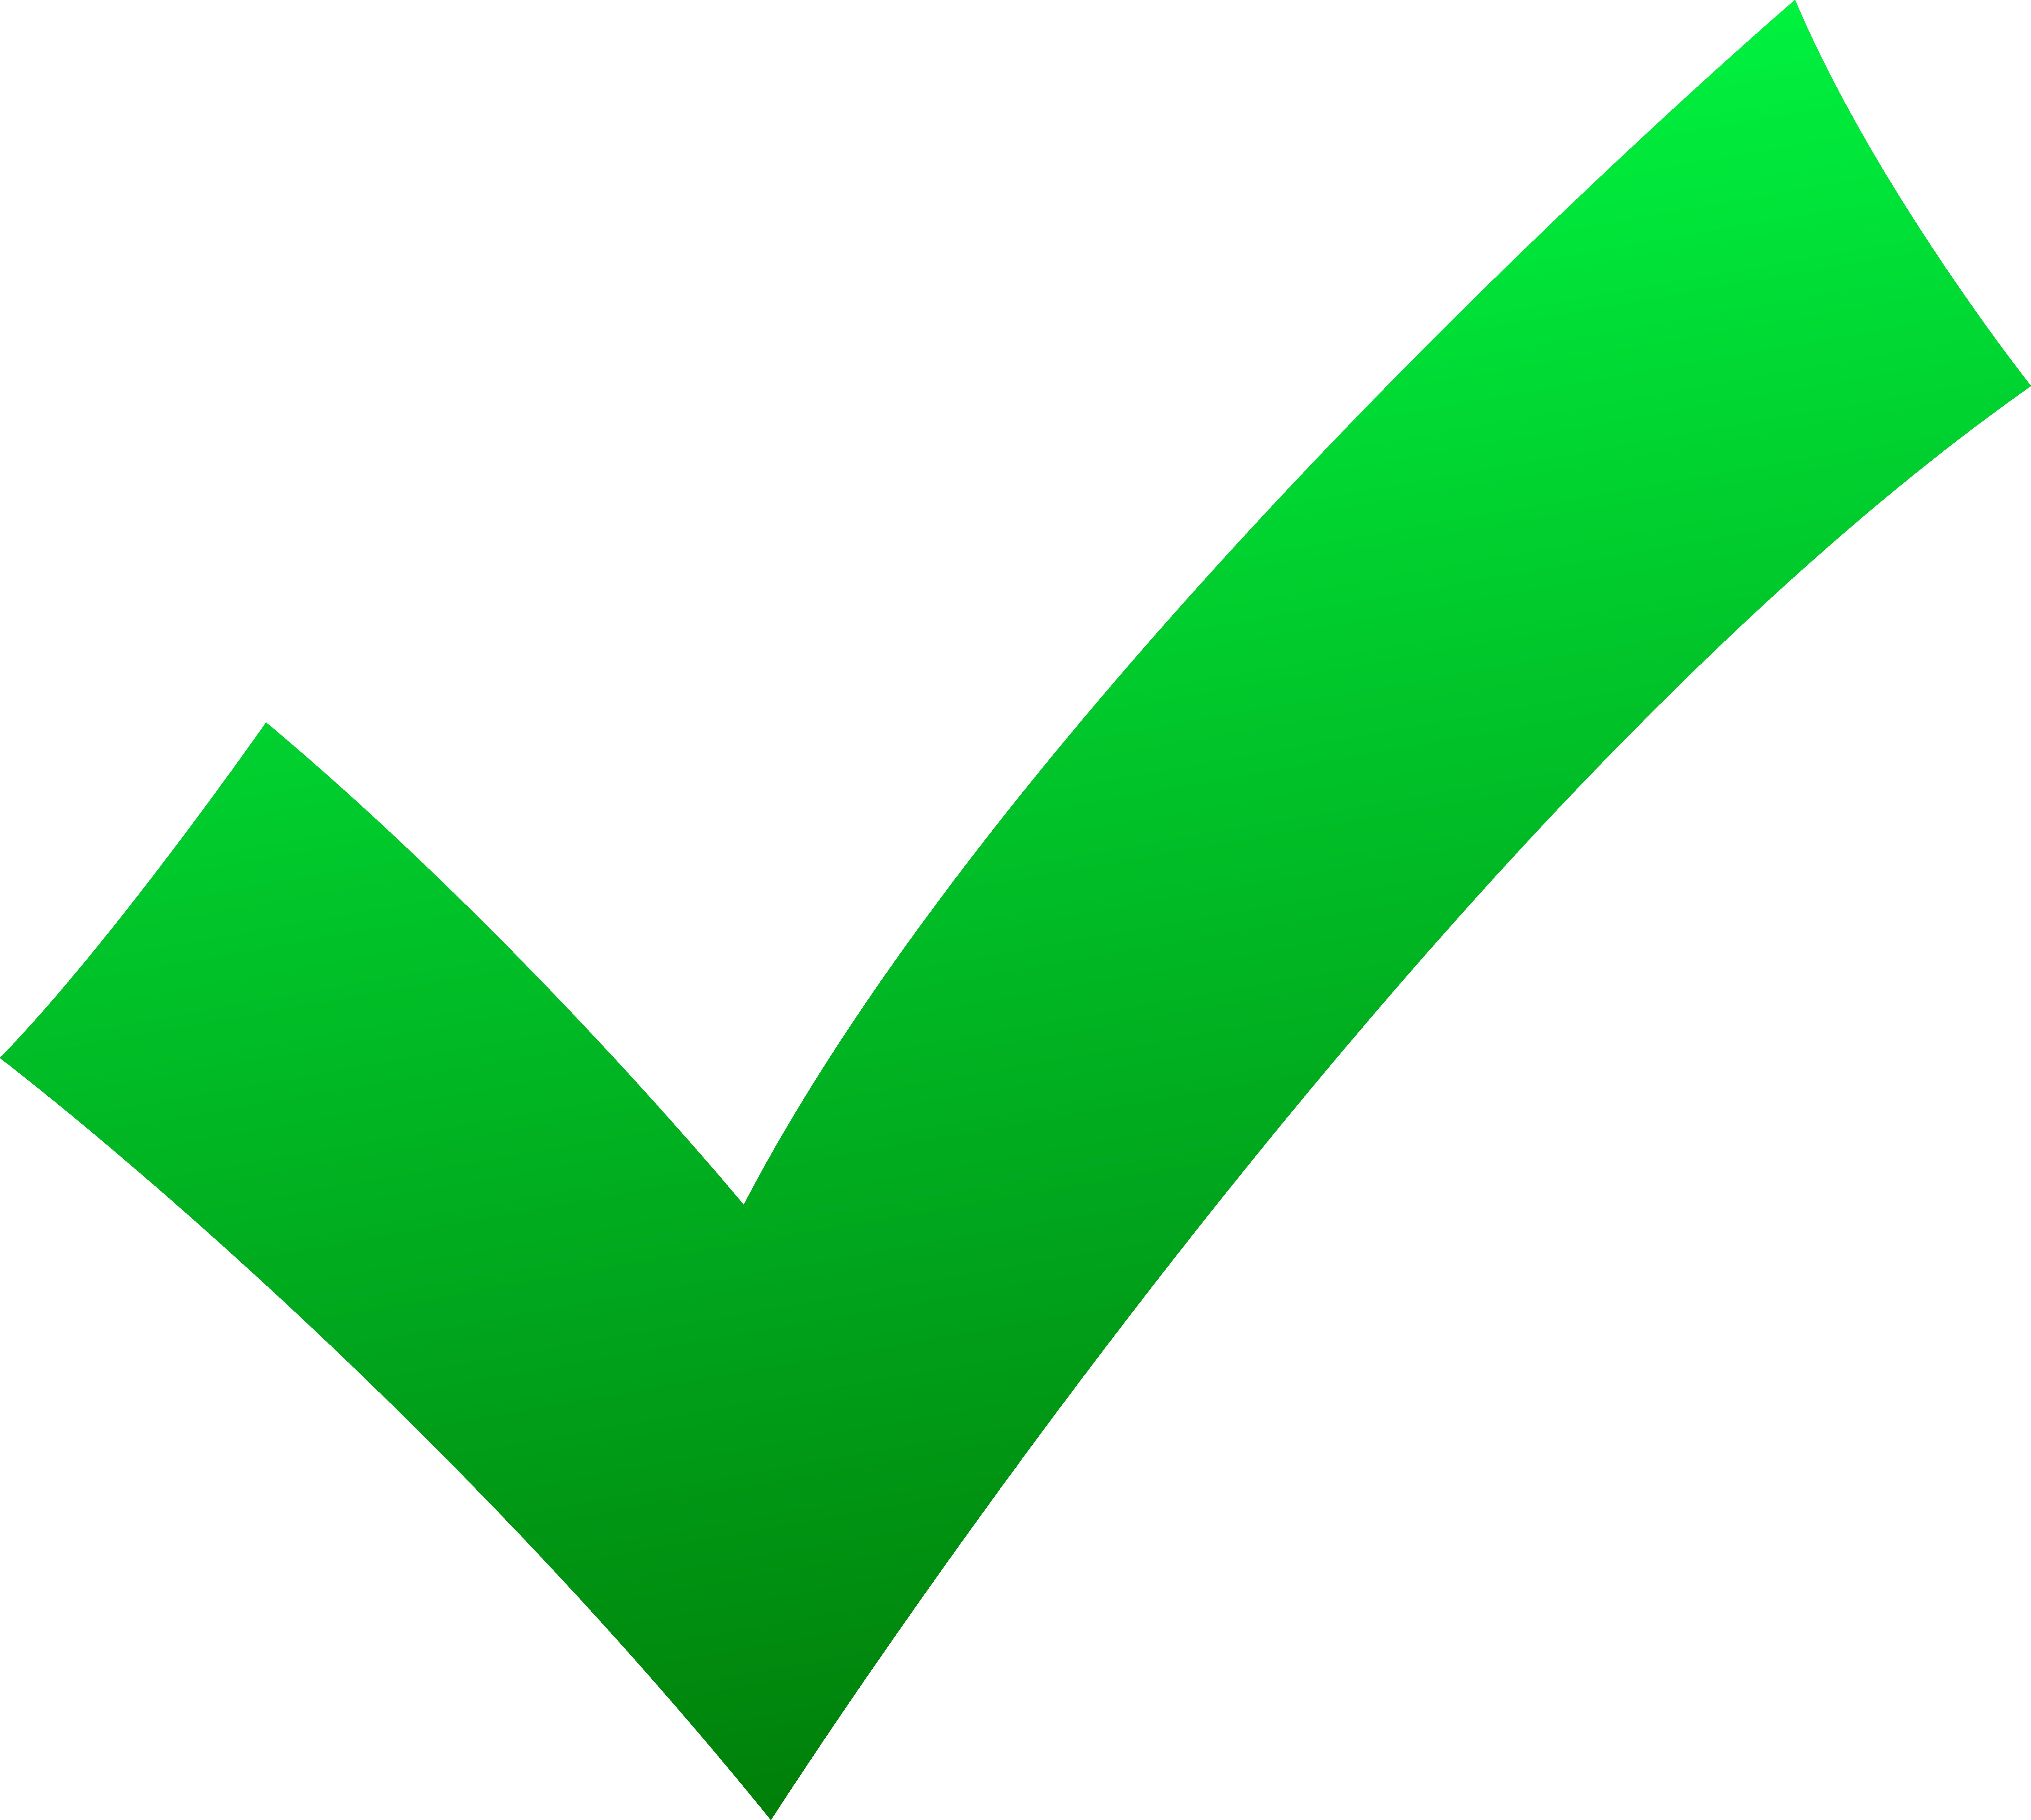 Transparent Check Mark - ClipArt Best